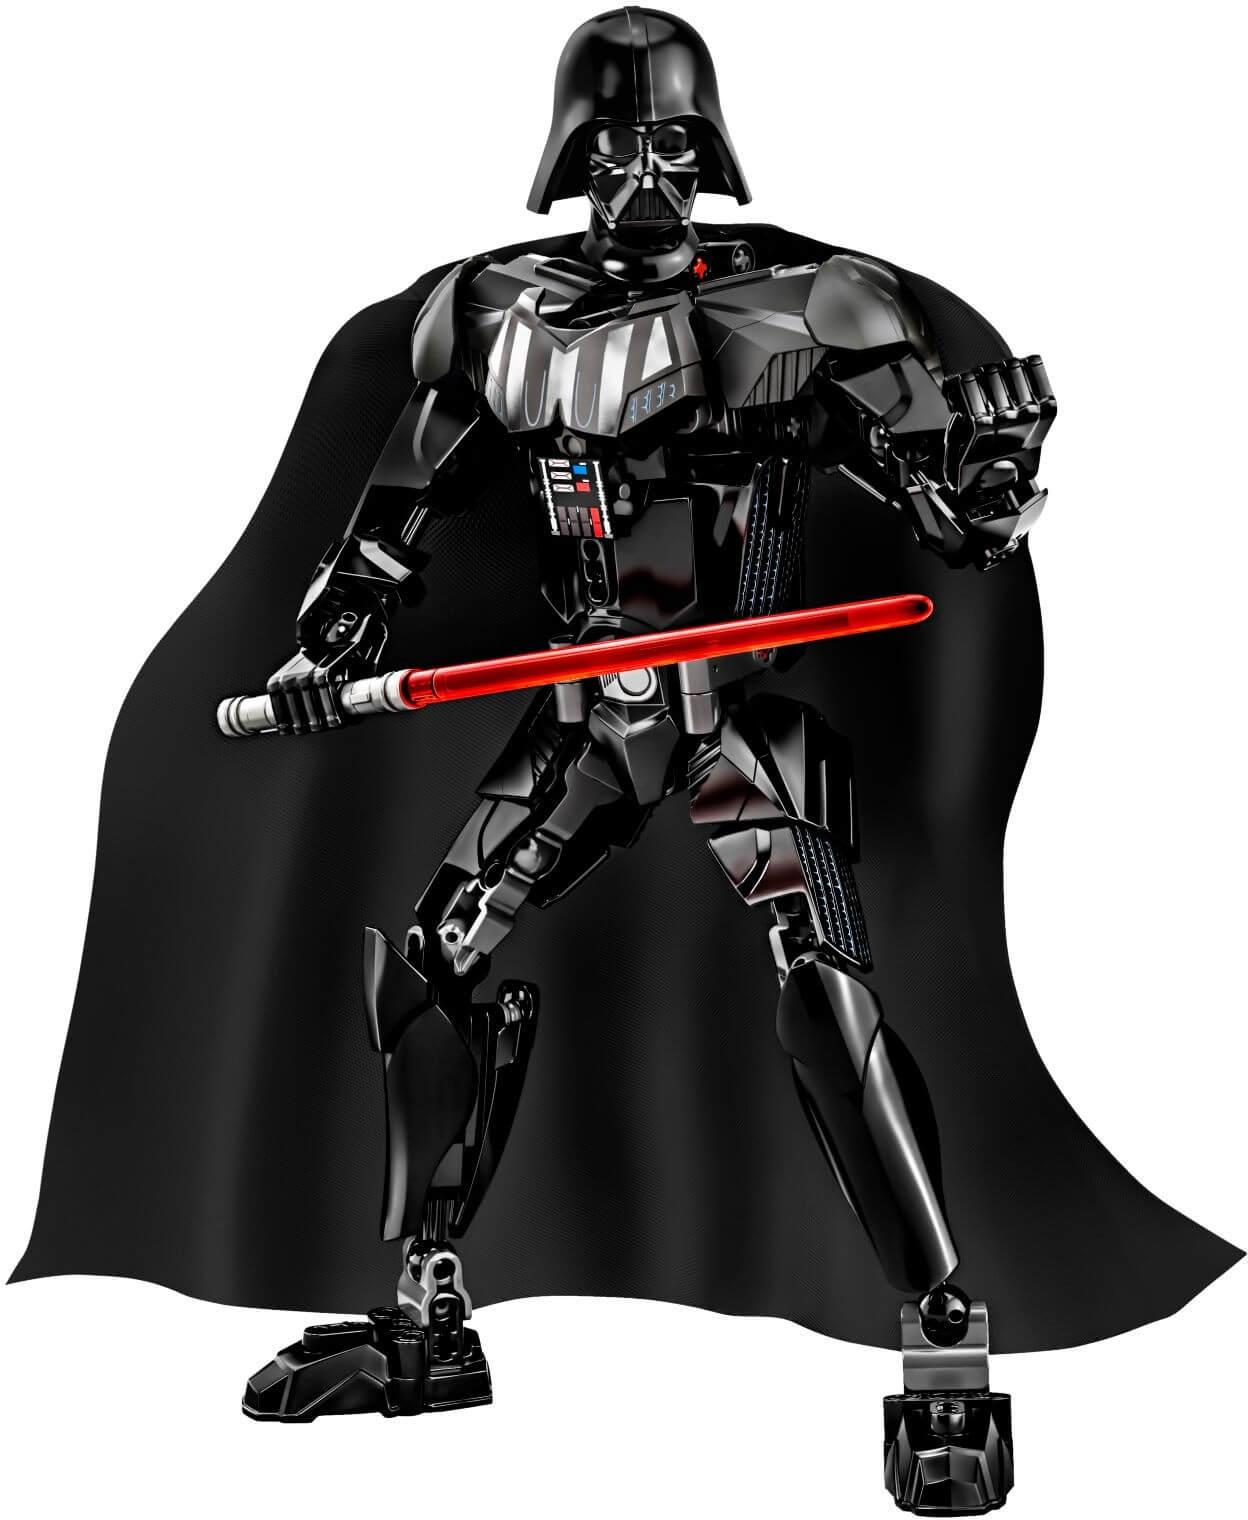 Mua đồ chơi LEGO 75111 - LEGO Star Wars 75111 - Mô hình Chúa tể bóng tối Darth Vader (LEGO Star Wars Darth Vader 75111)